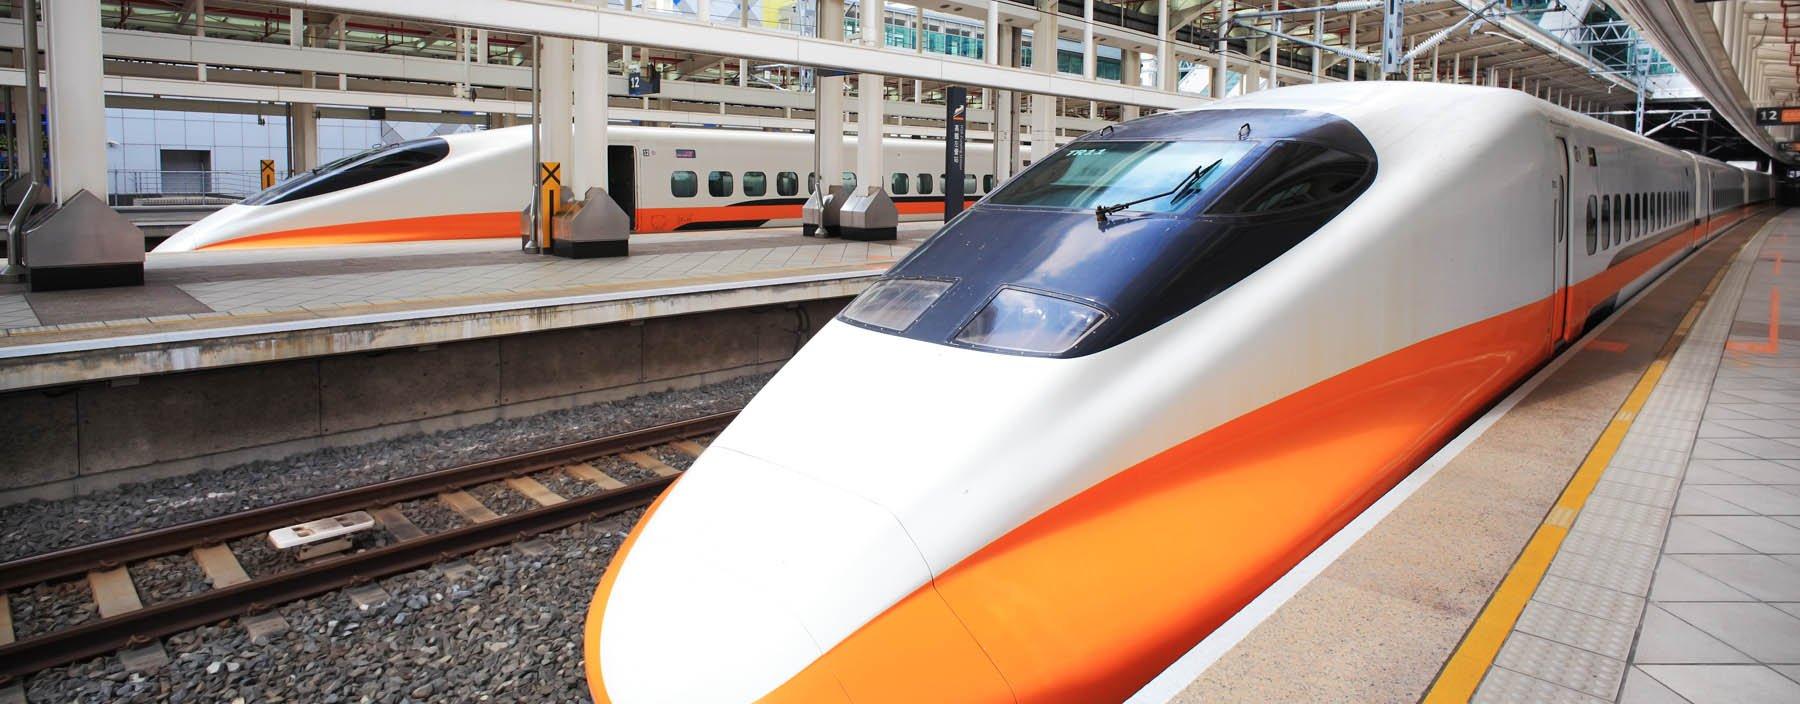 jp, high speed bullet train.jpg